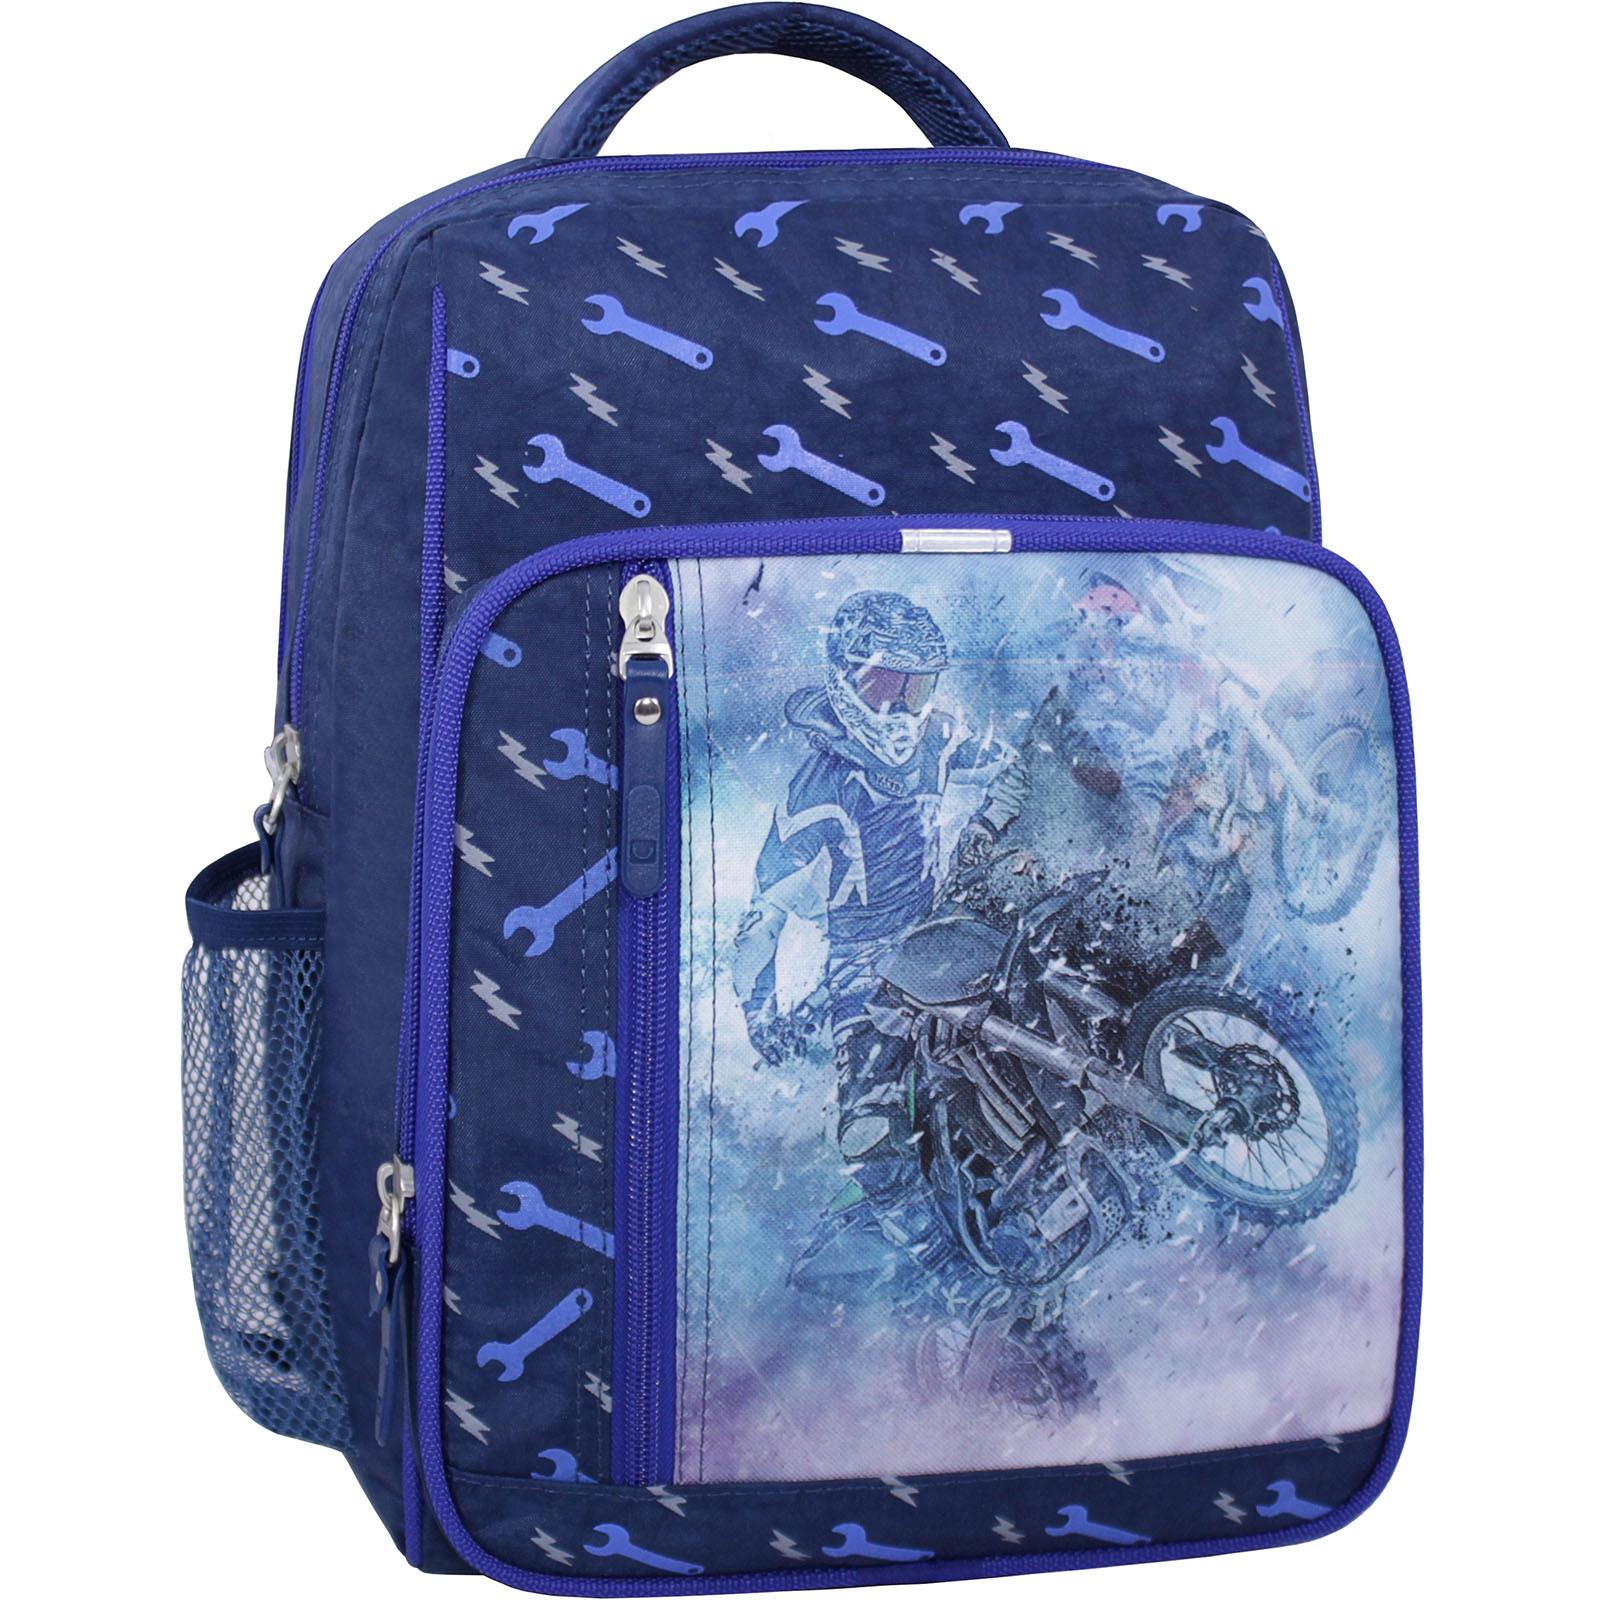 Школьные рюкзаки Рюкзак школьный Bagland Школьник 8 л. 225 синий 534 (00112702) IMG_2522_суб.534_.JPG